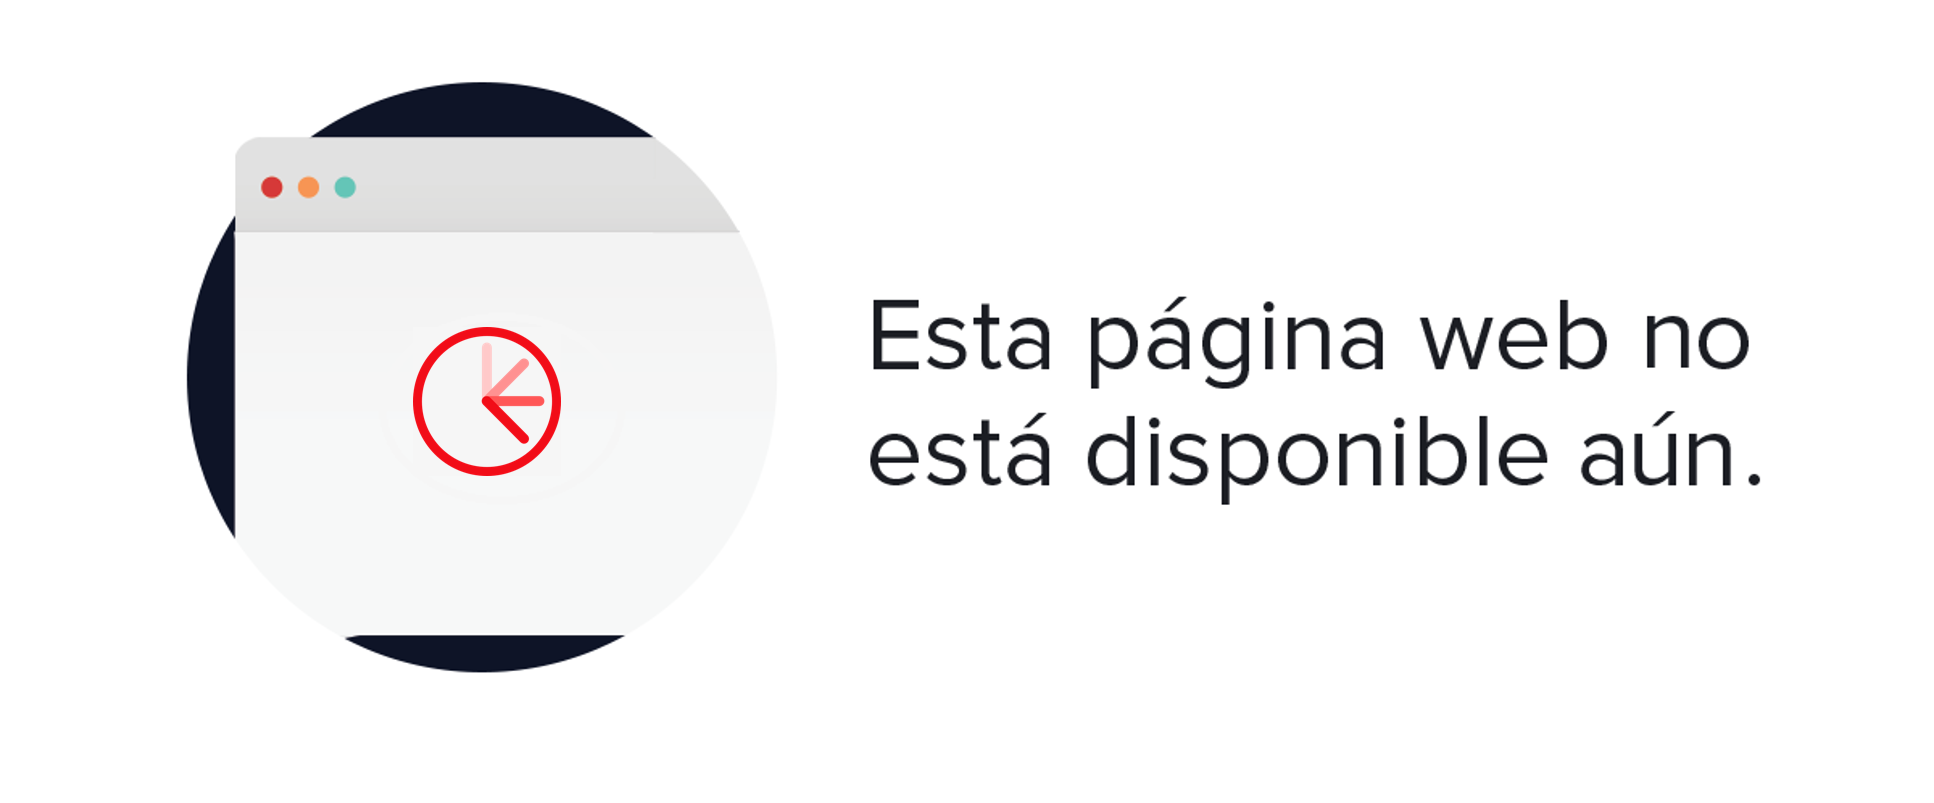 TANGA GOMINOLA PARA EL FRESAS CON CAVA